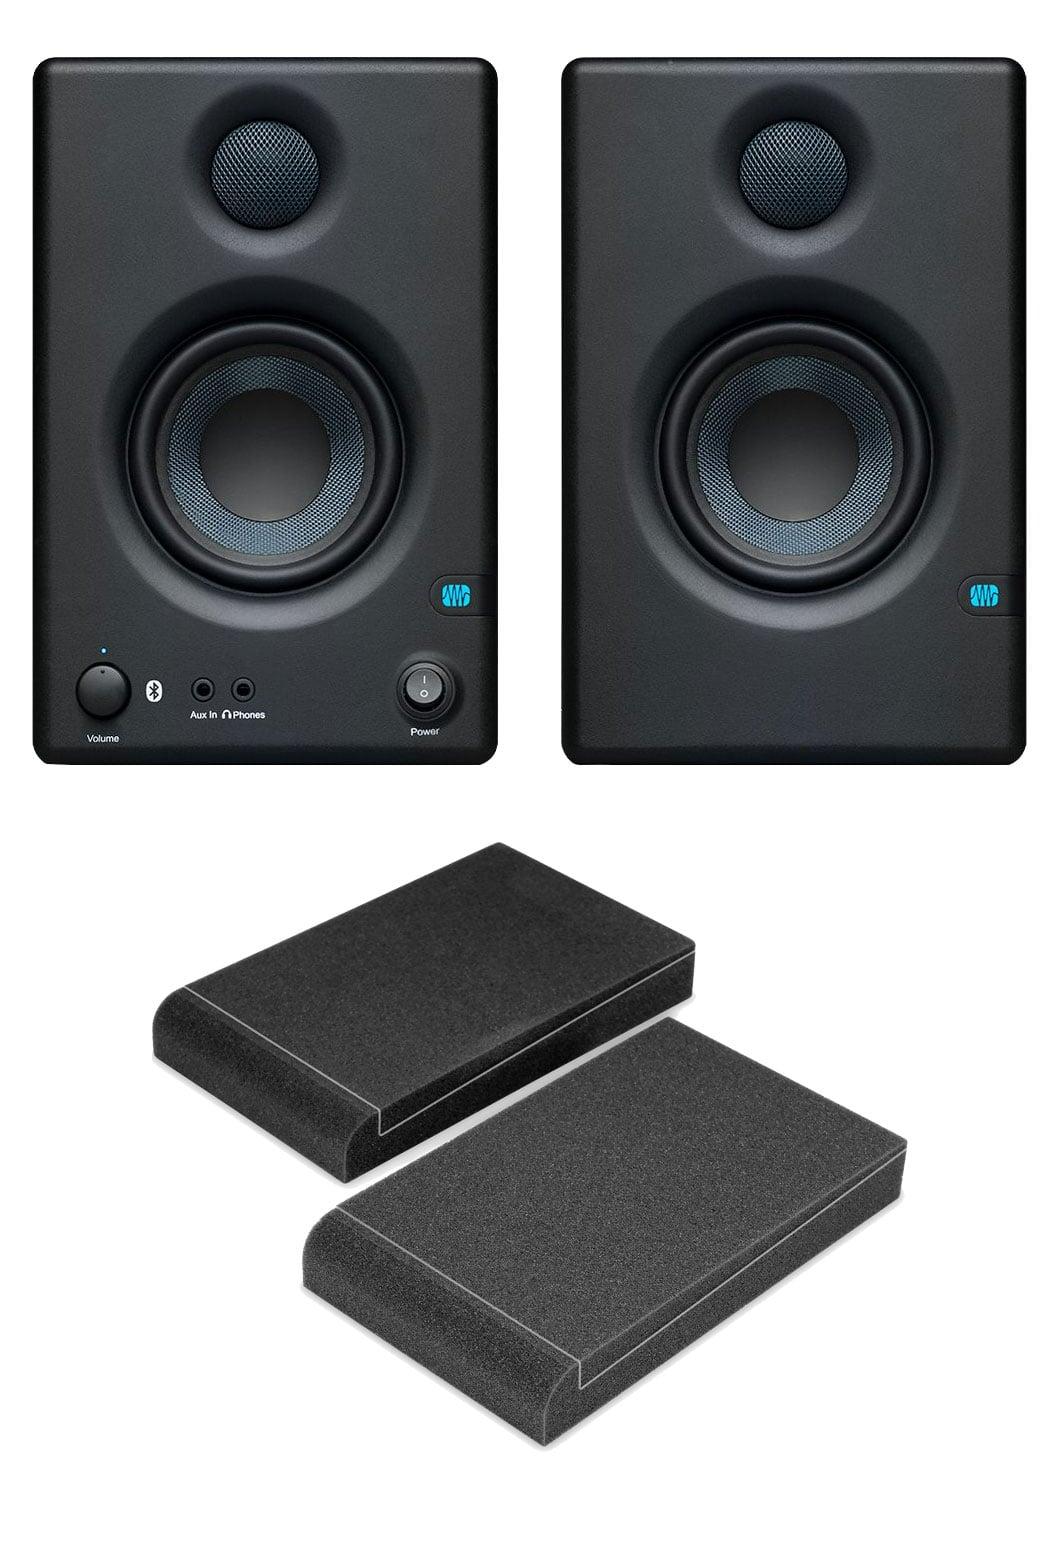 Studiomonitore - PreSonus Eris E3.5 BT Aktives Studiomonitor Paar inkl. Absorberplatten - Onlineshop Musikhaus Kirstein